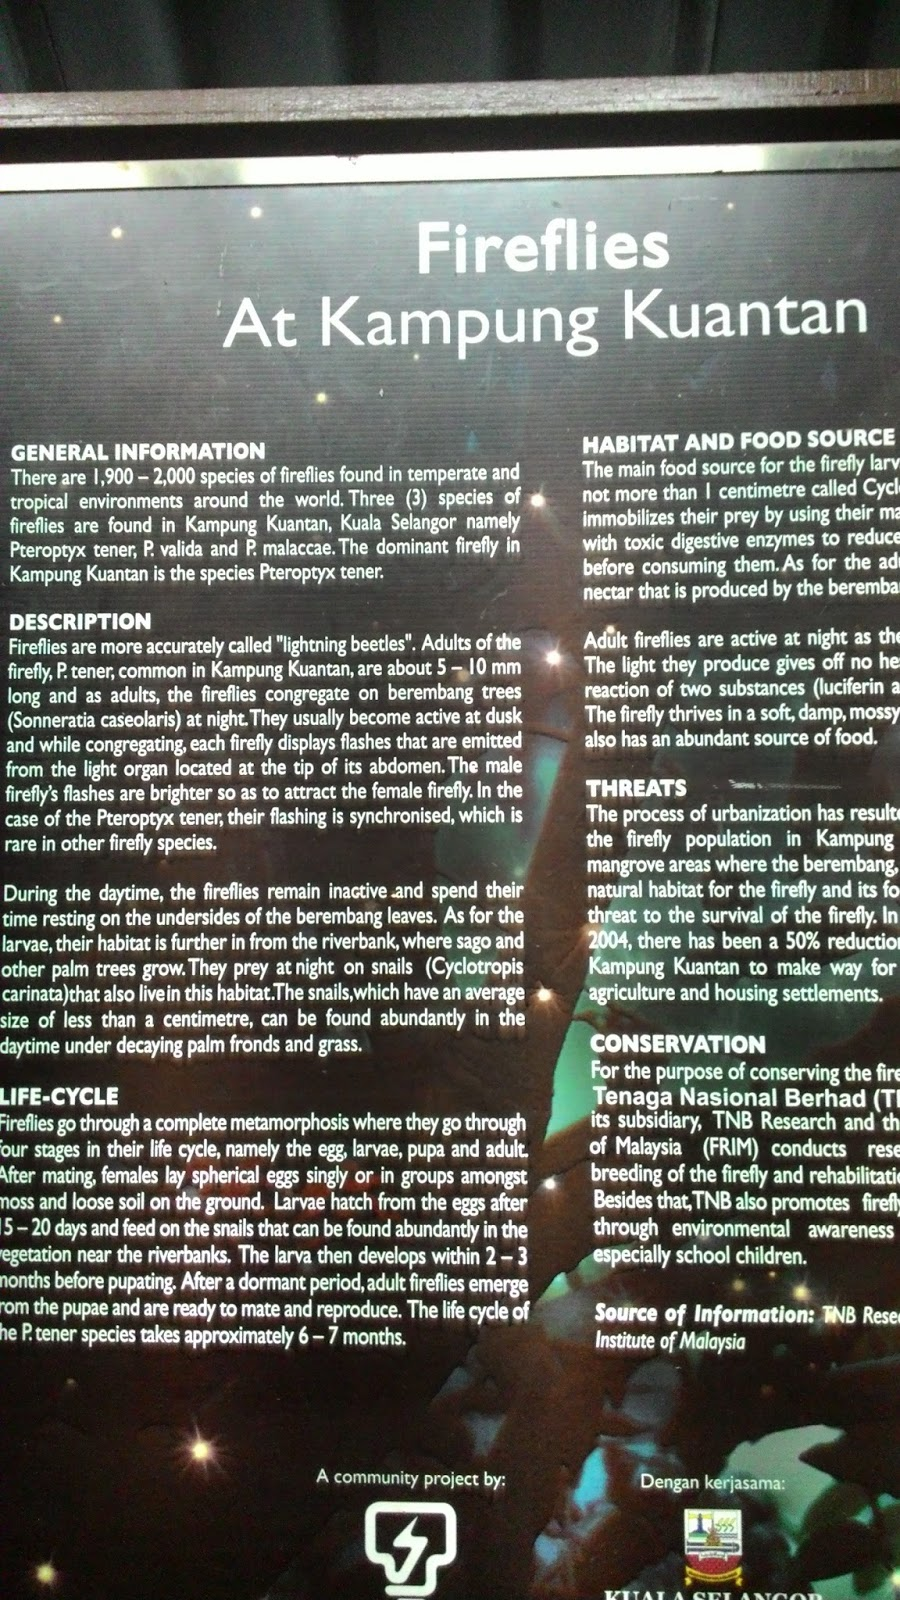 Info board at Kampung Kuantan Fireflies Park